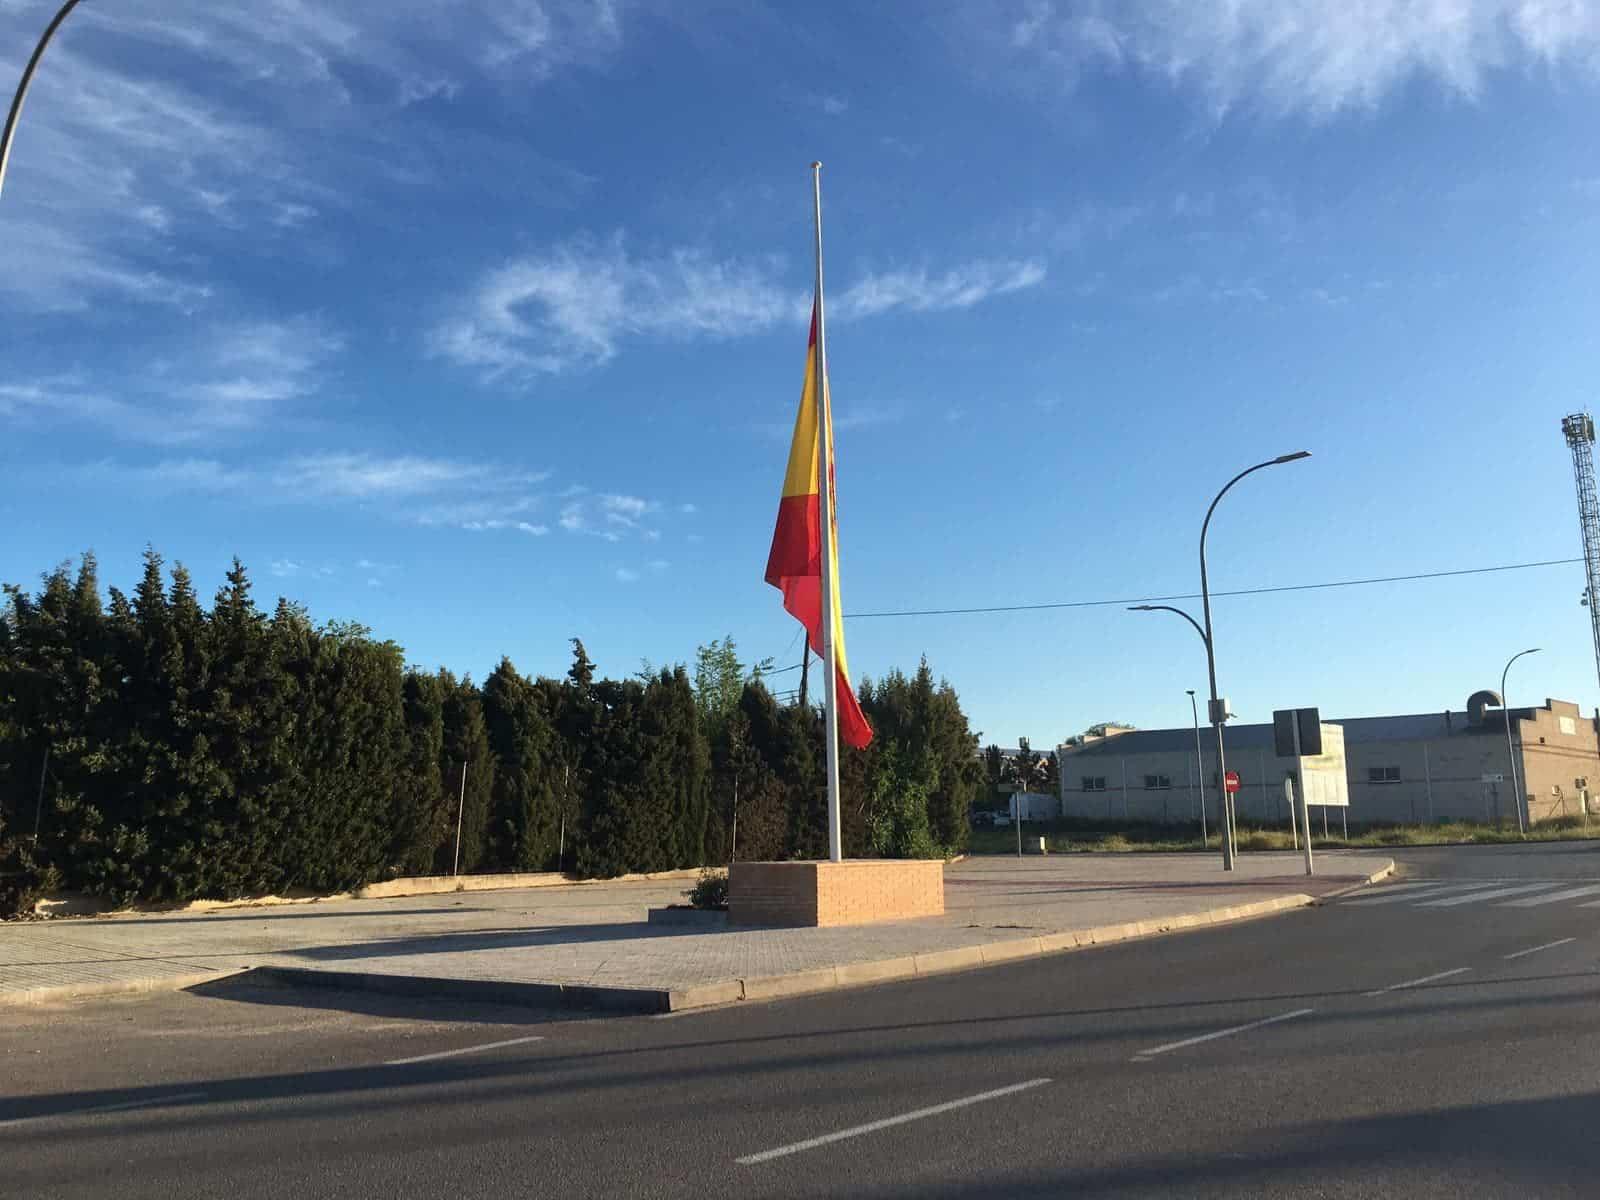 luto herencia poligono coronavirus - Luto oficial en Herencia por los fallecidos por coronavirus, banderas a media asta